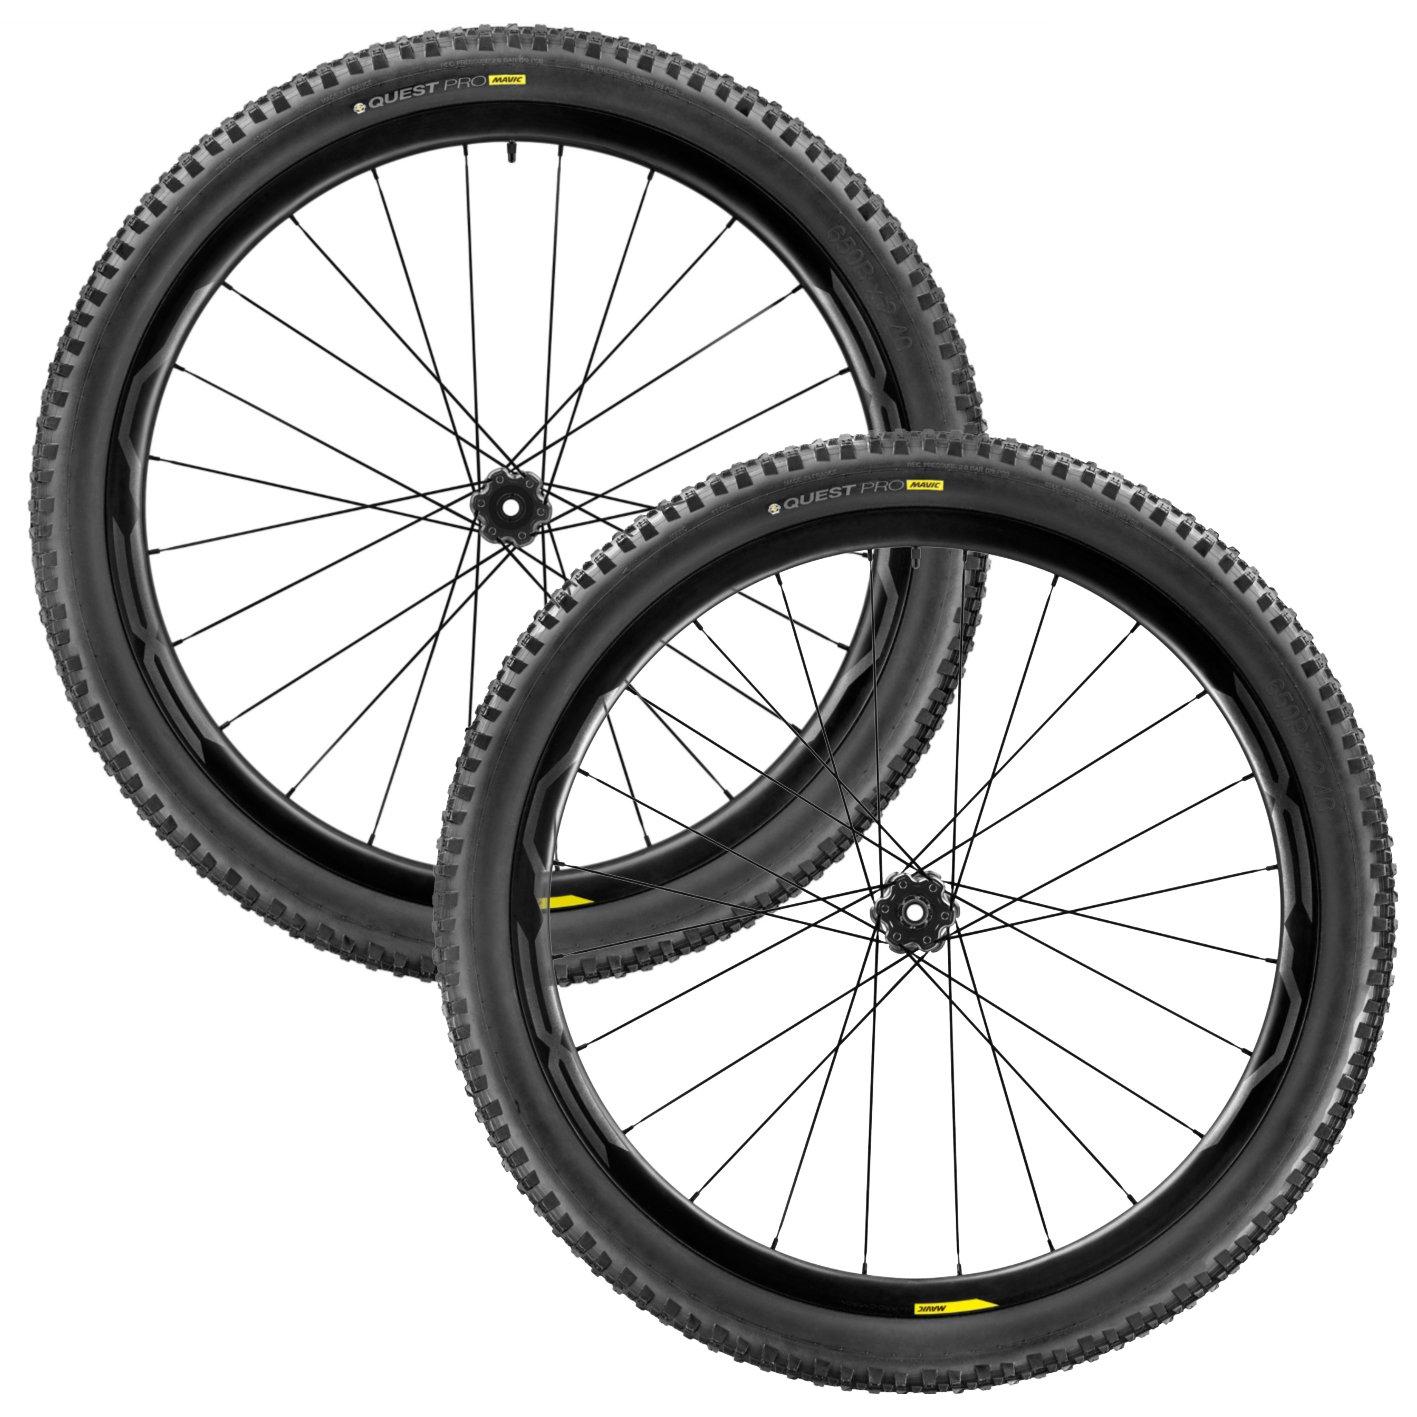 MAVIC(マビック) XA PRO CARBON 27.5x2.40 MTB Wheelset 2017 - [Shimano/Sram] [並行輸入品] B07433BL9S